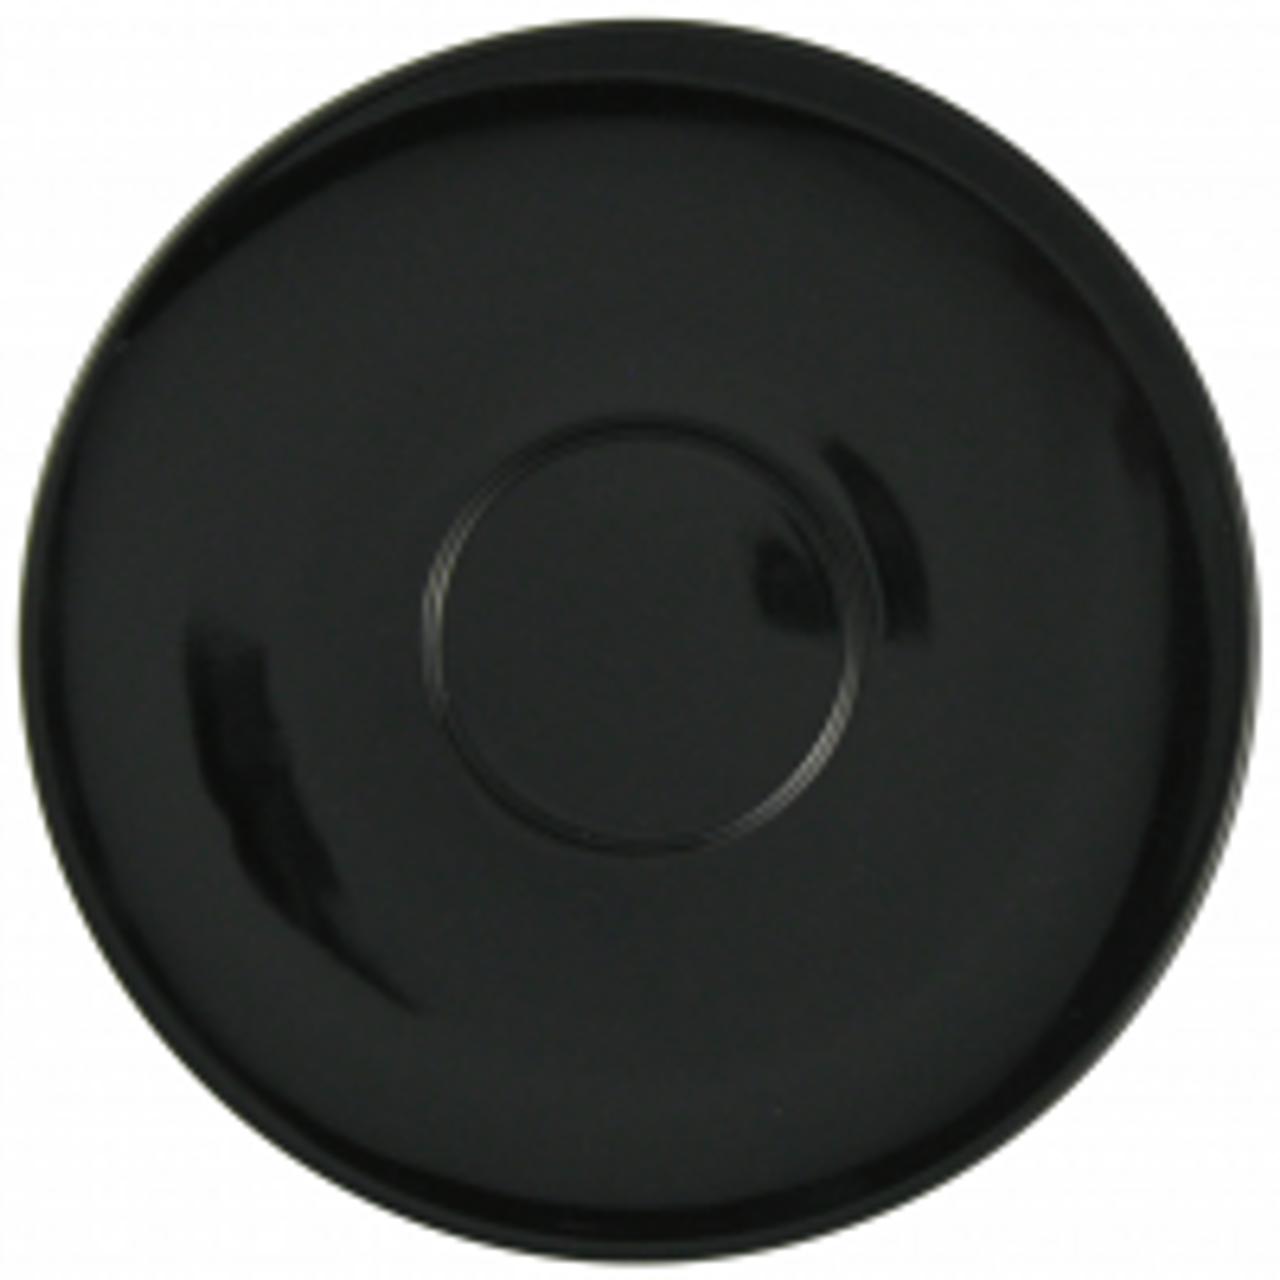 "Revolution Revware Saucer, 6.5"", black"